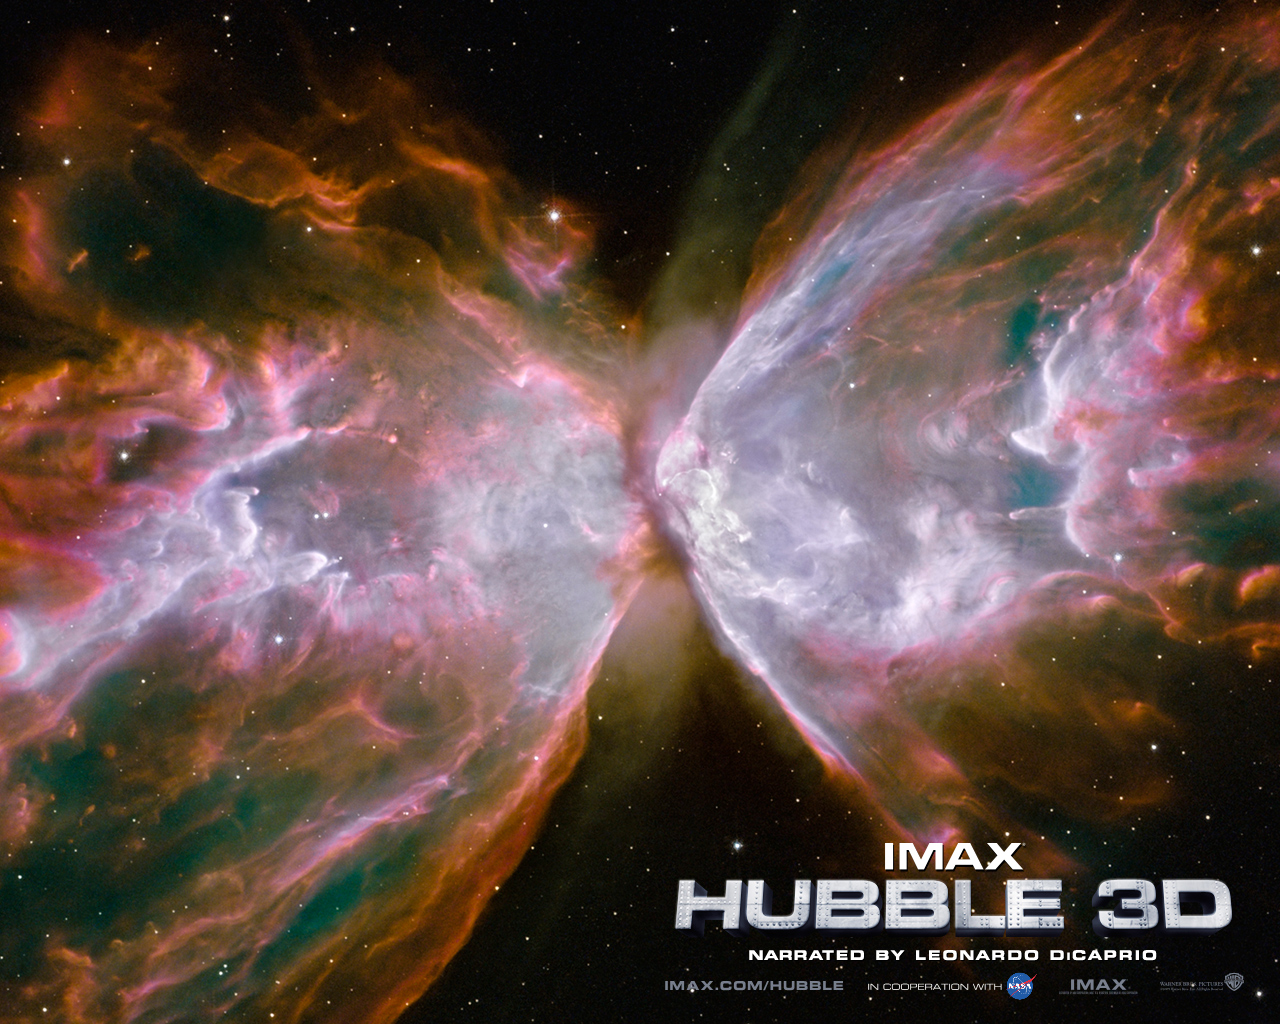 hubble 3d imax - HD1280×1024